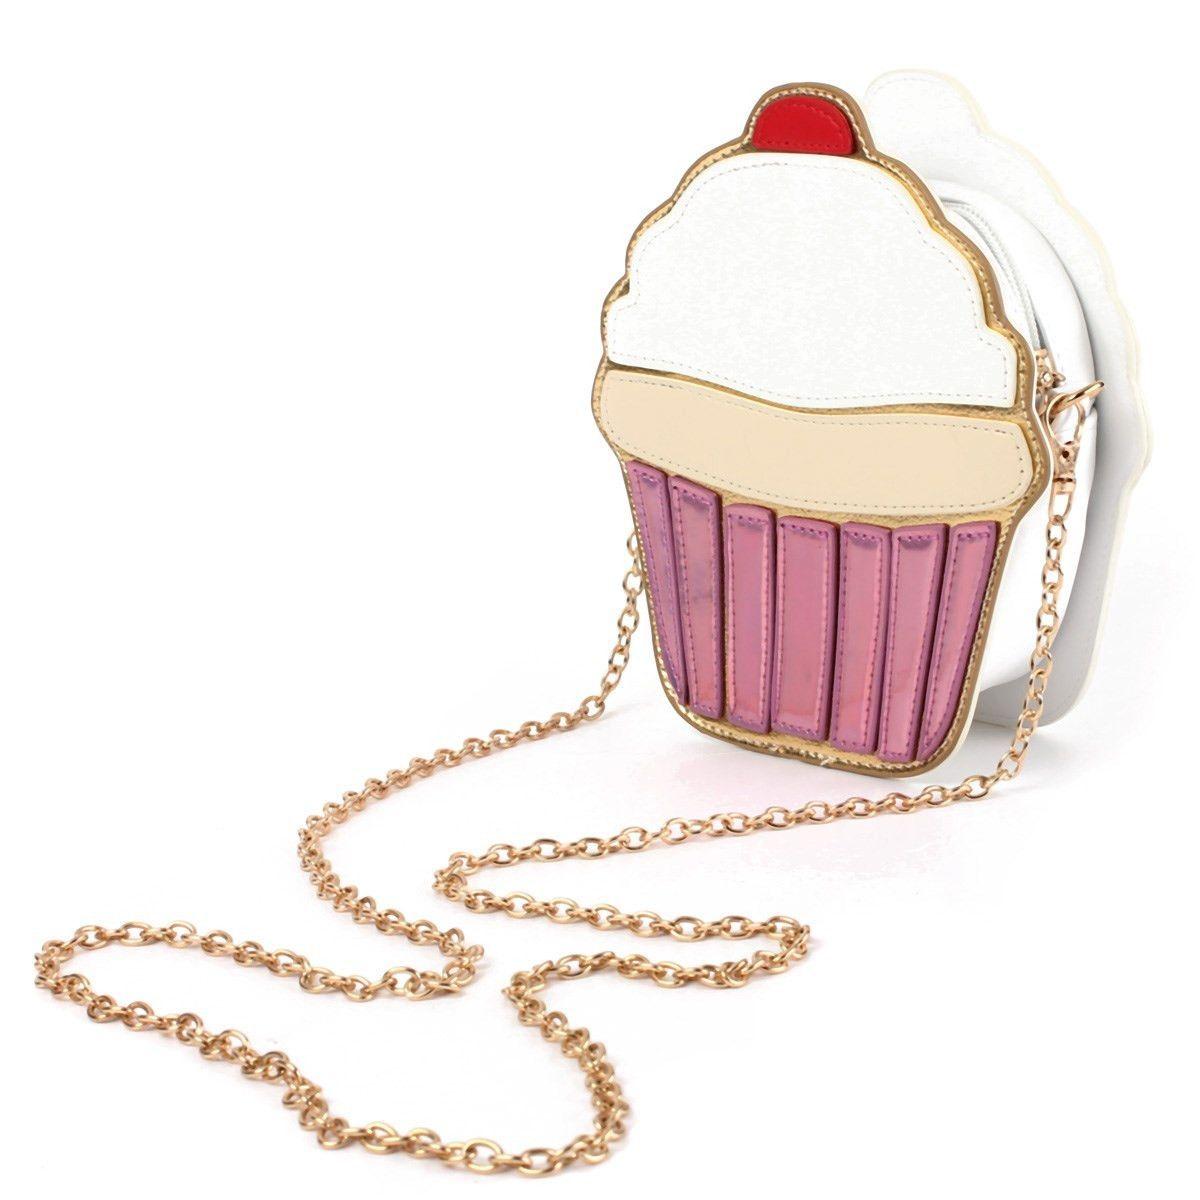 83afe964e43fd Chain Clutch Crossbody Bag Lady Shoulder Bag Girl Cupcake Small Cute Purse  Mini Cream Bag Cake Pattern Design Fashion Style